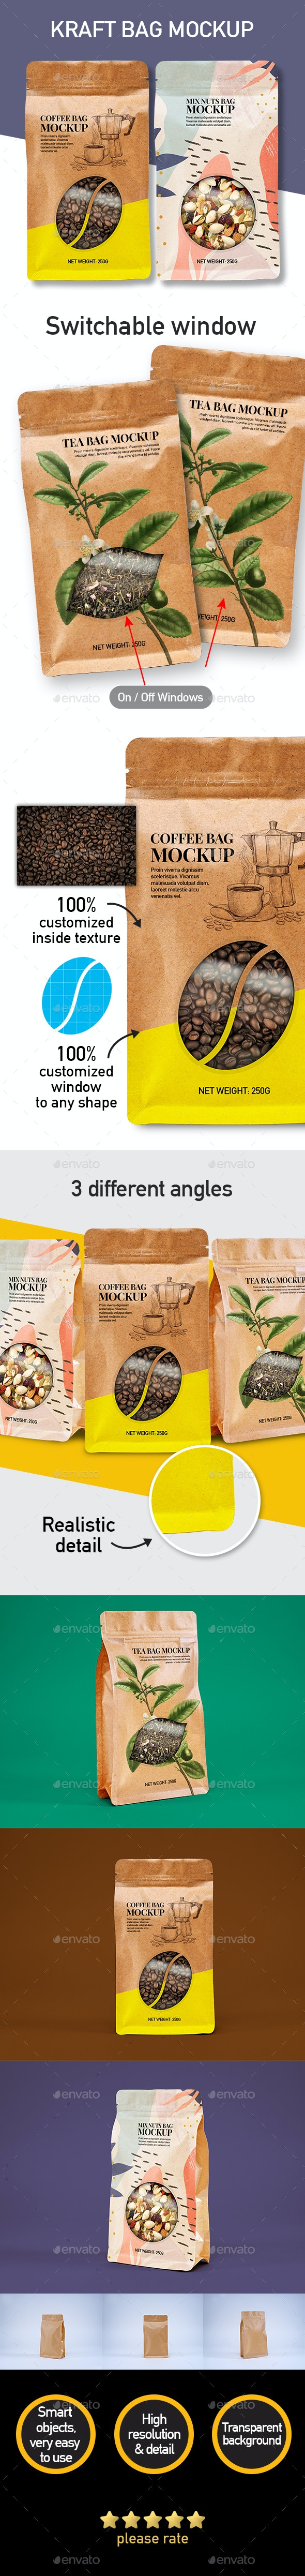 Kraft Pouch Bag Packaging Mockup - Packaging Product Mock-Ups